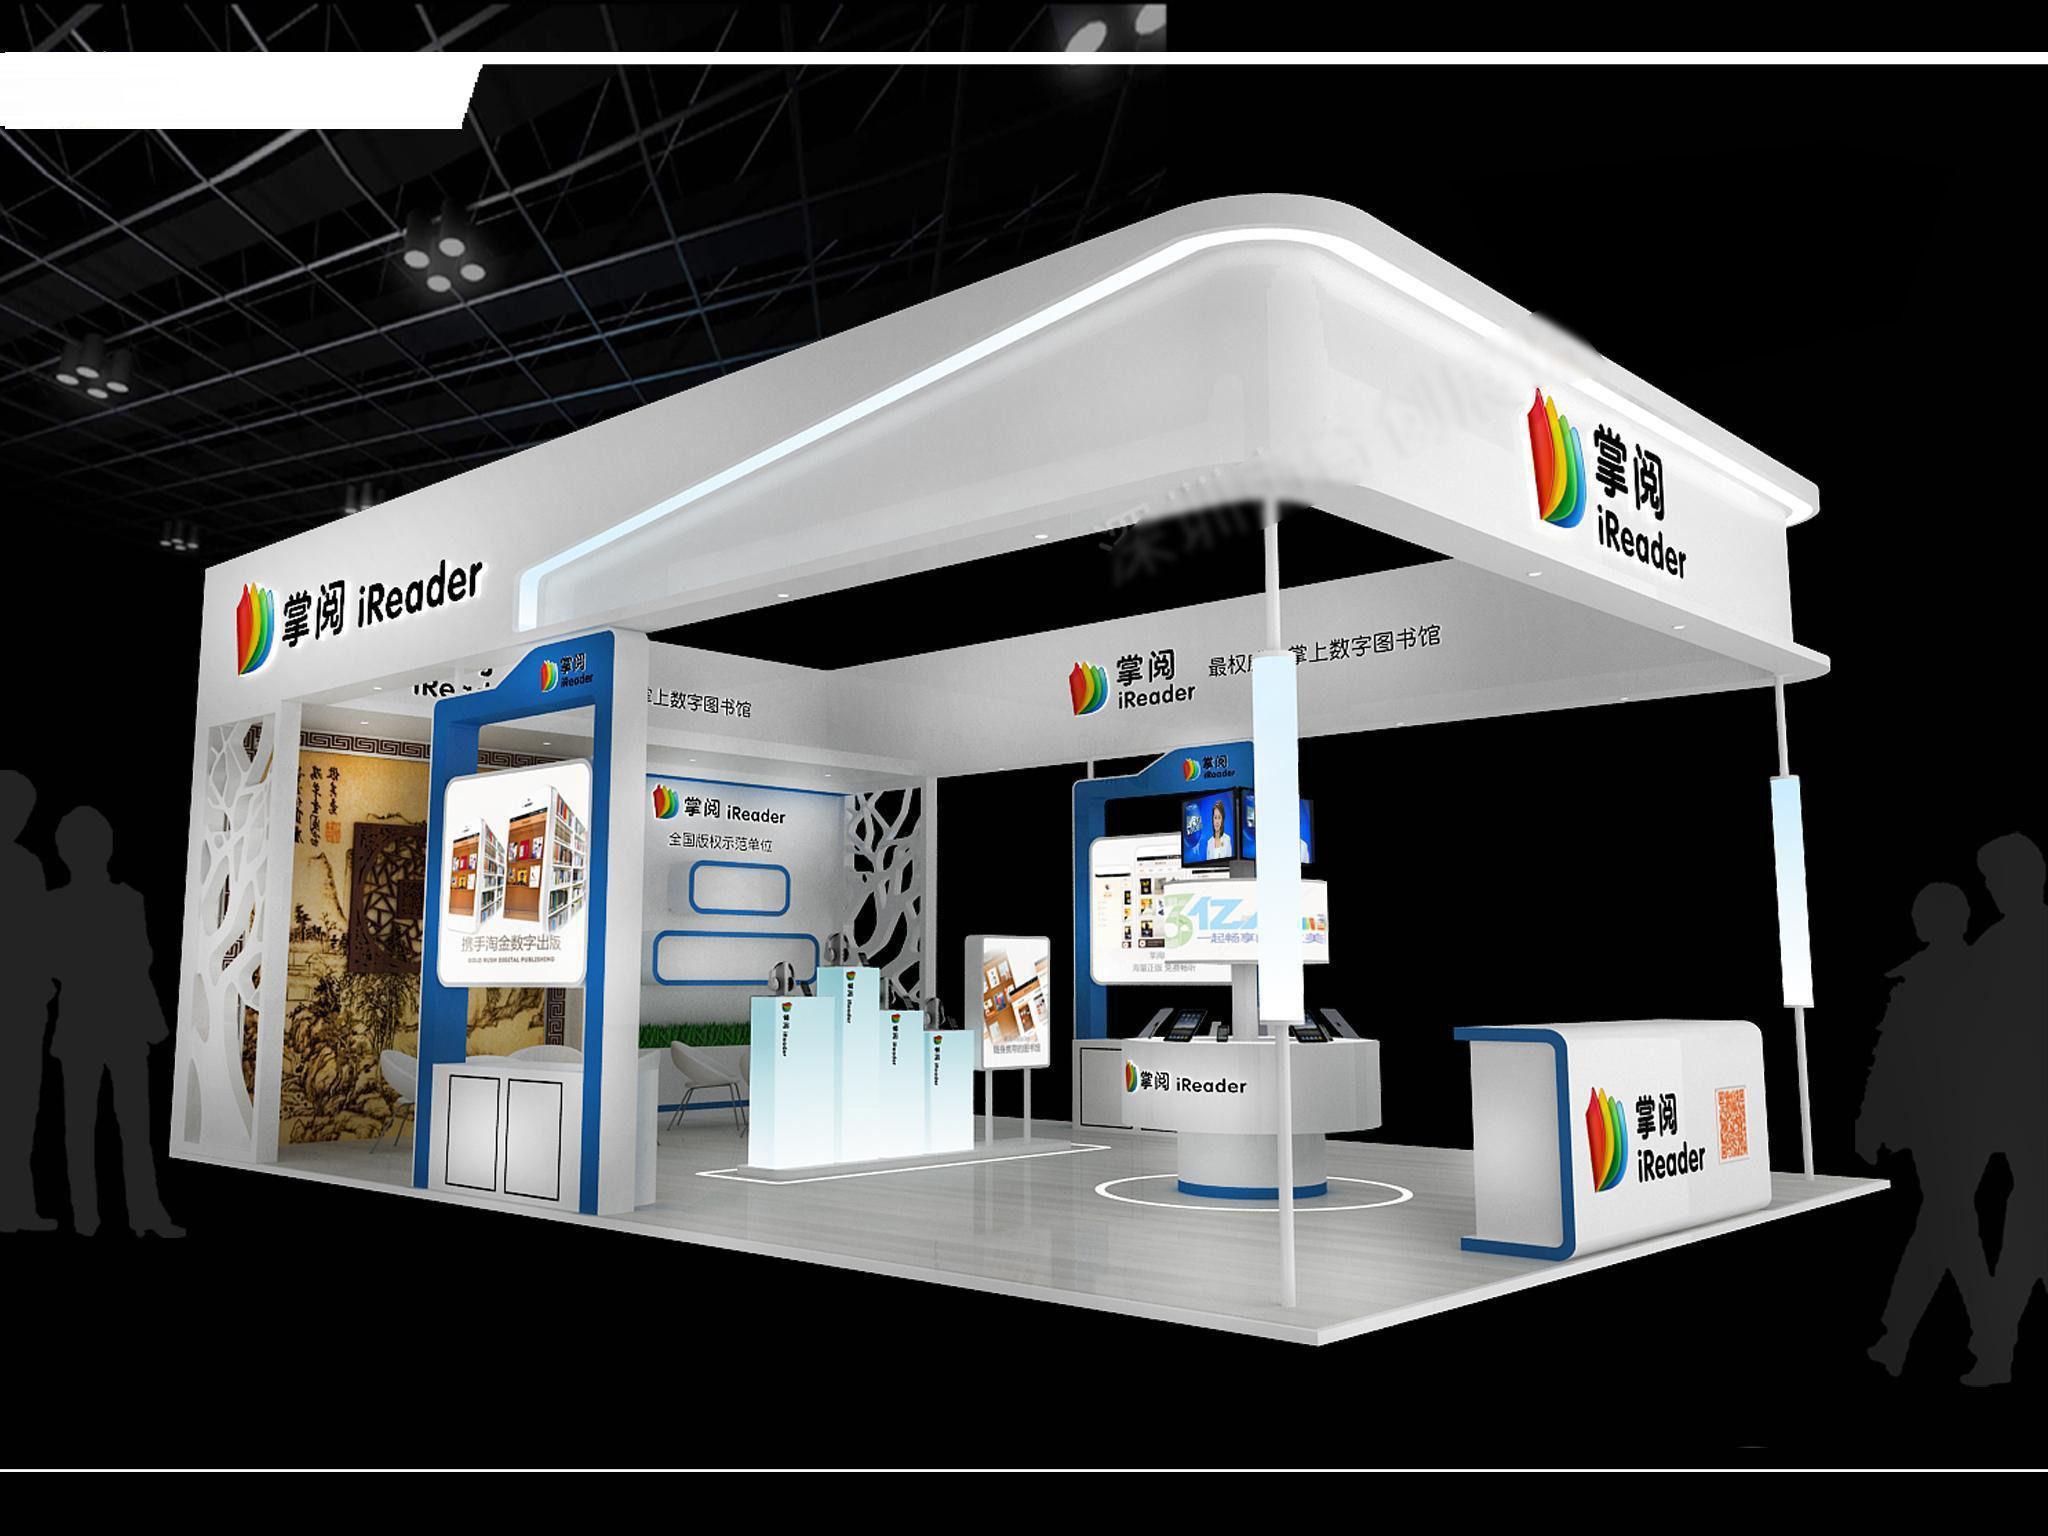 Exhibition area 6x93dmax2010 27532 3d model 3ds for Area933